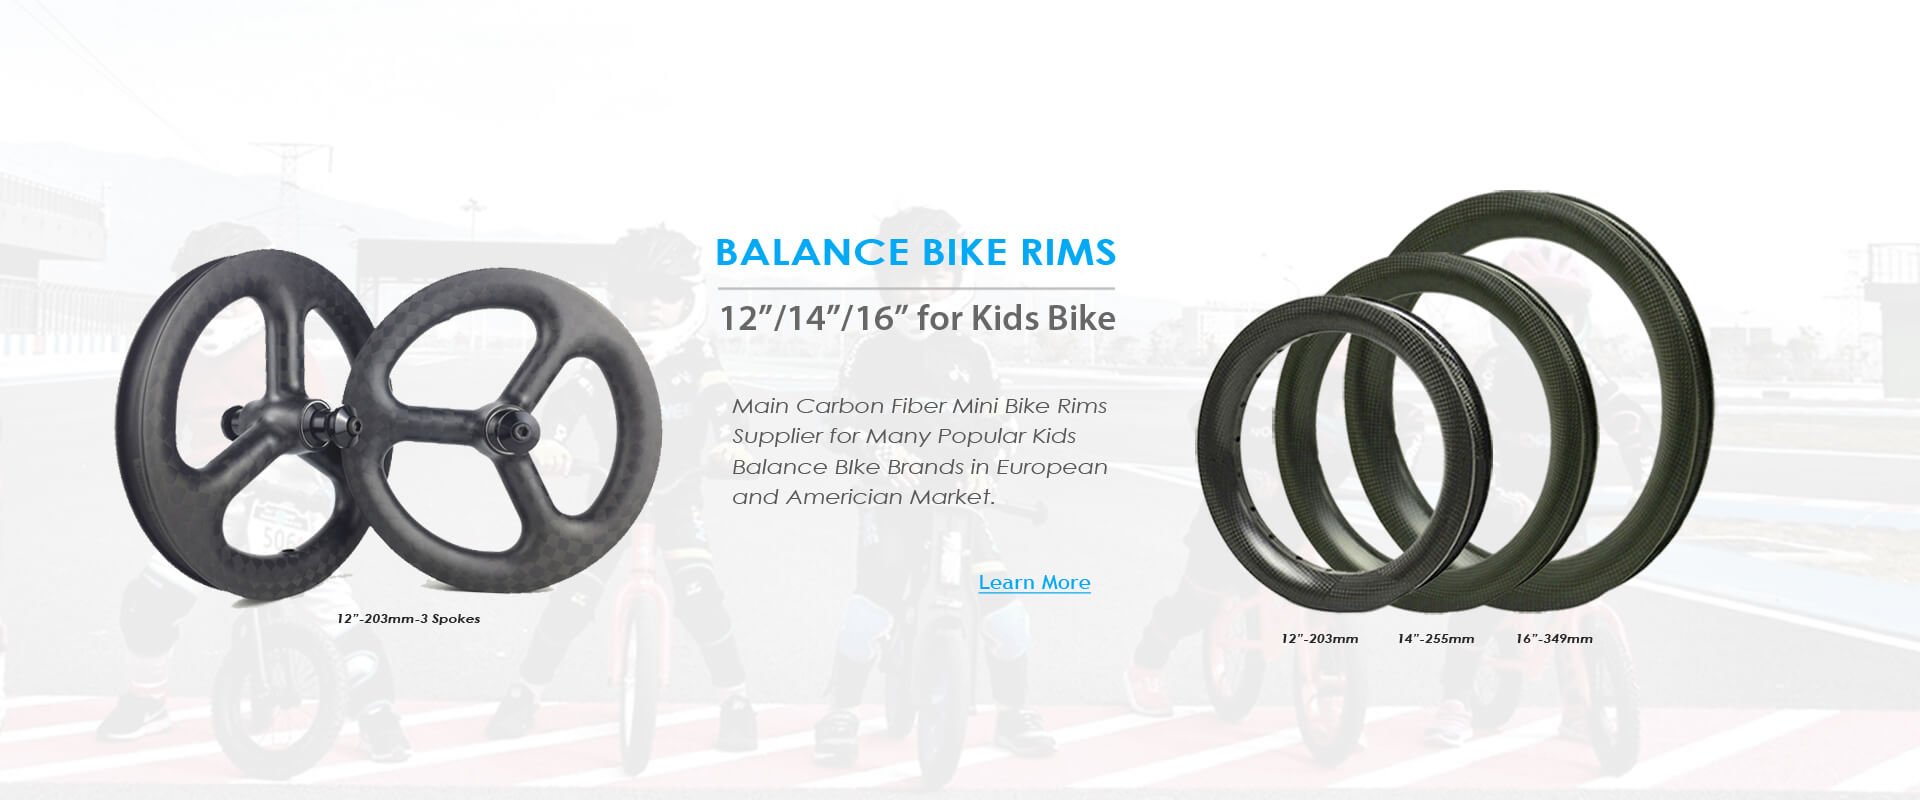 72ad9186aeb5 Carbon Bike Frames Forks Rims Wheels Supplier-Pavi Bikes